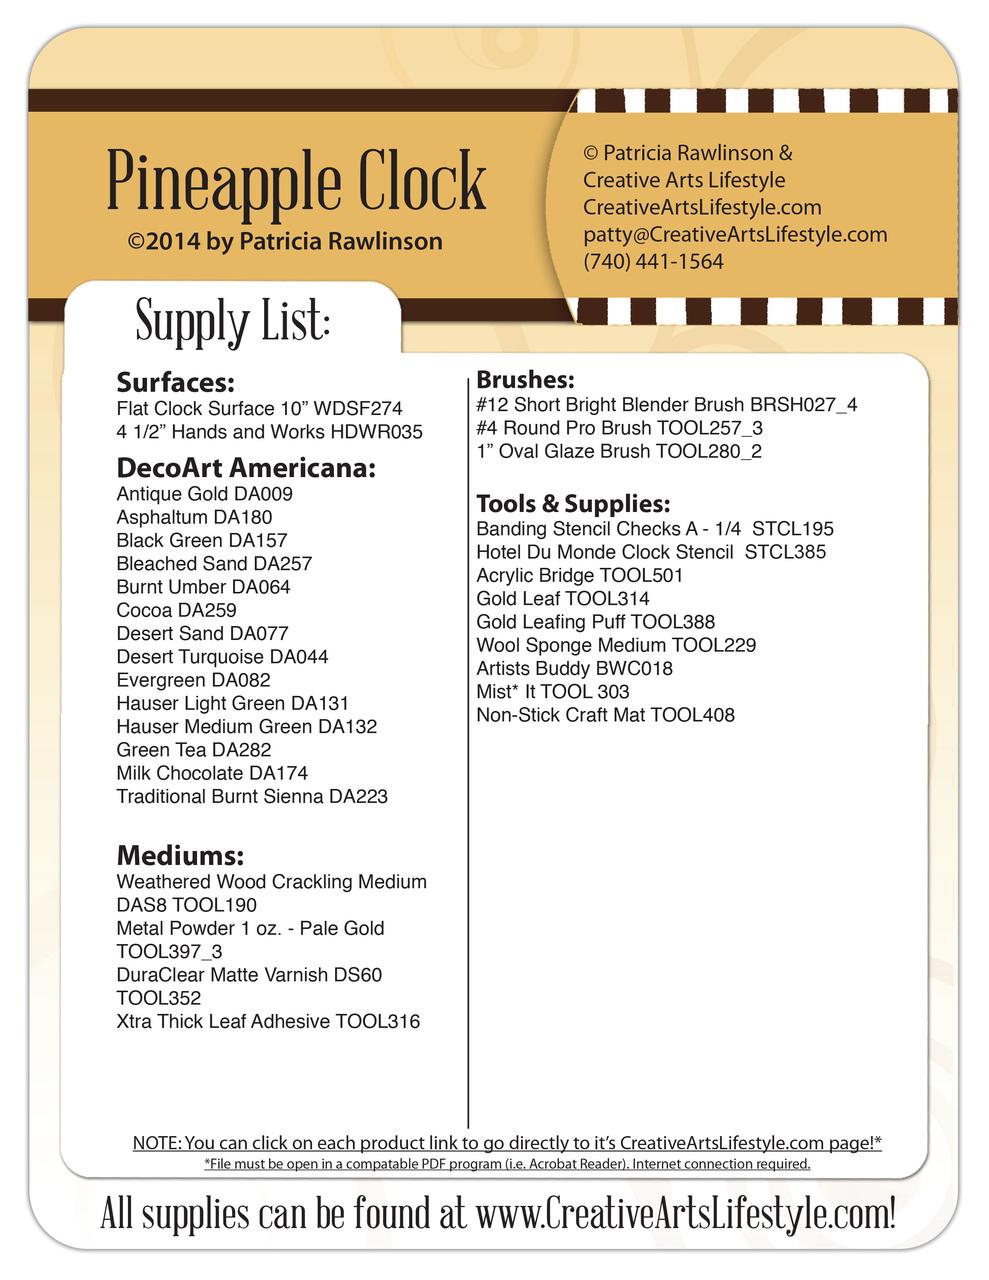 Pineapple Clock DVD - Patricia Rawlinson